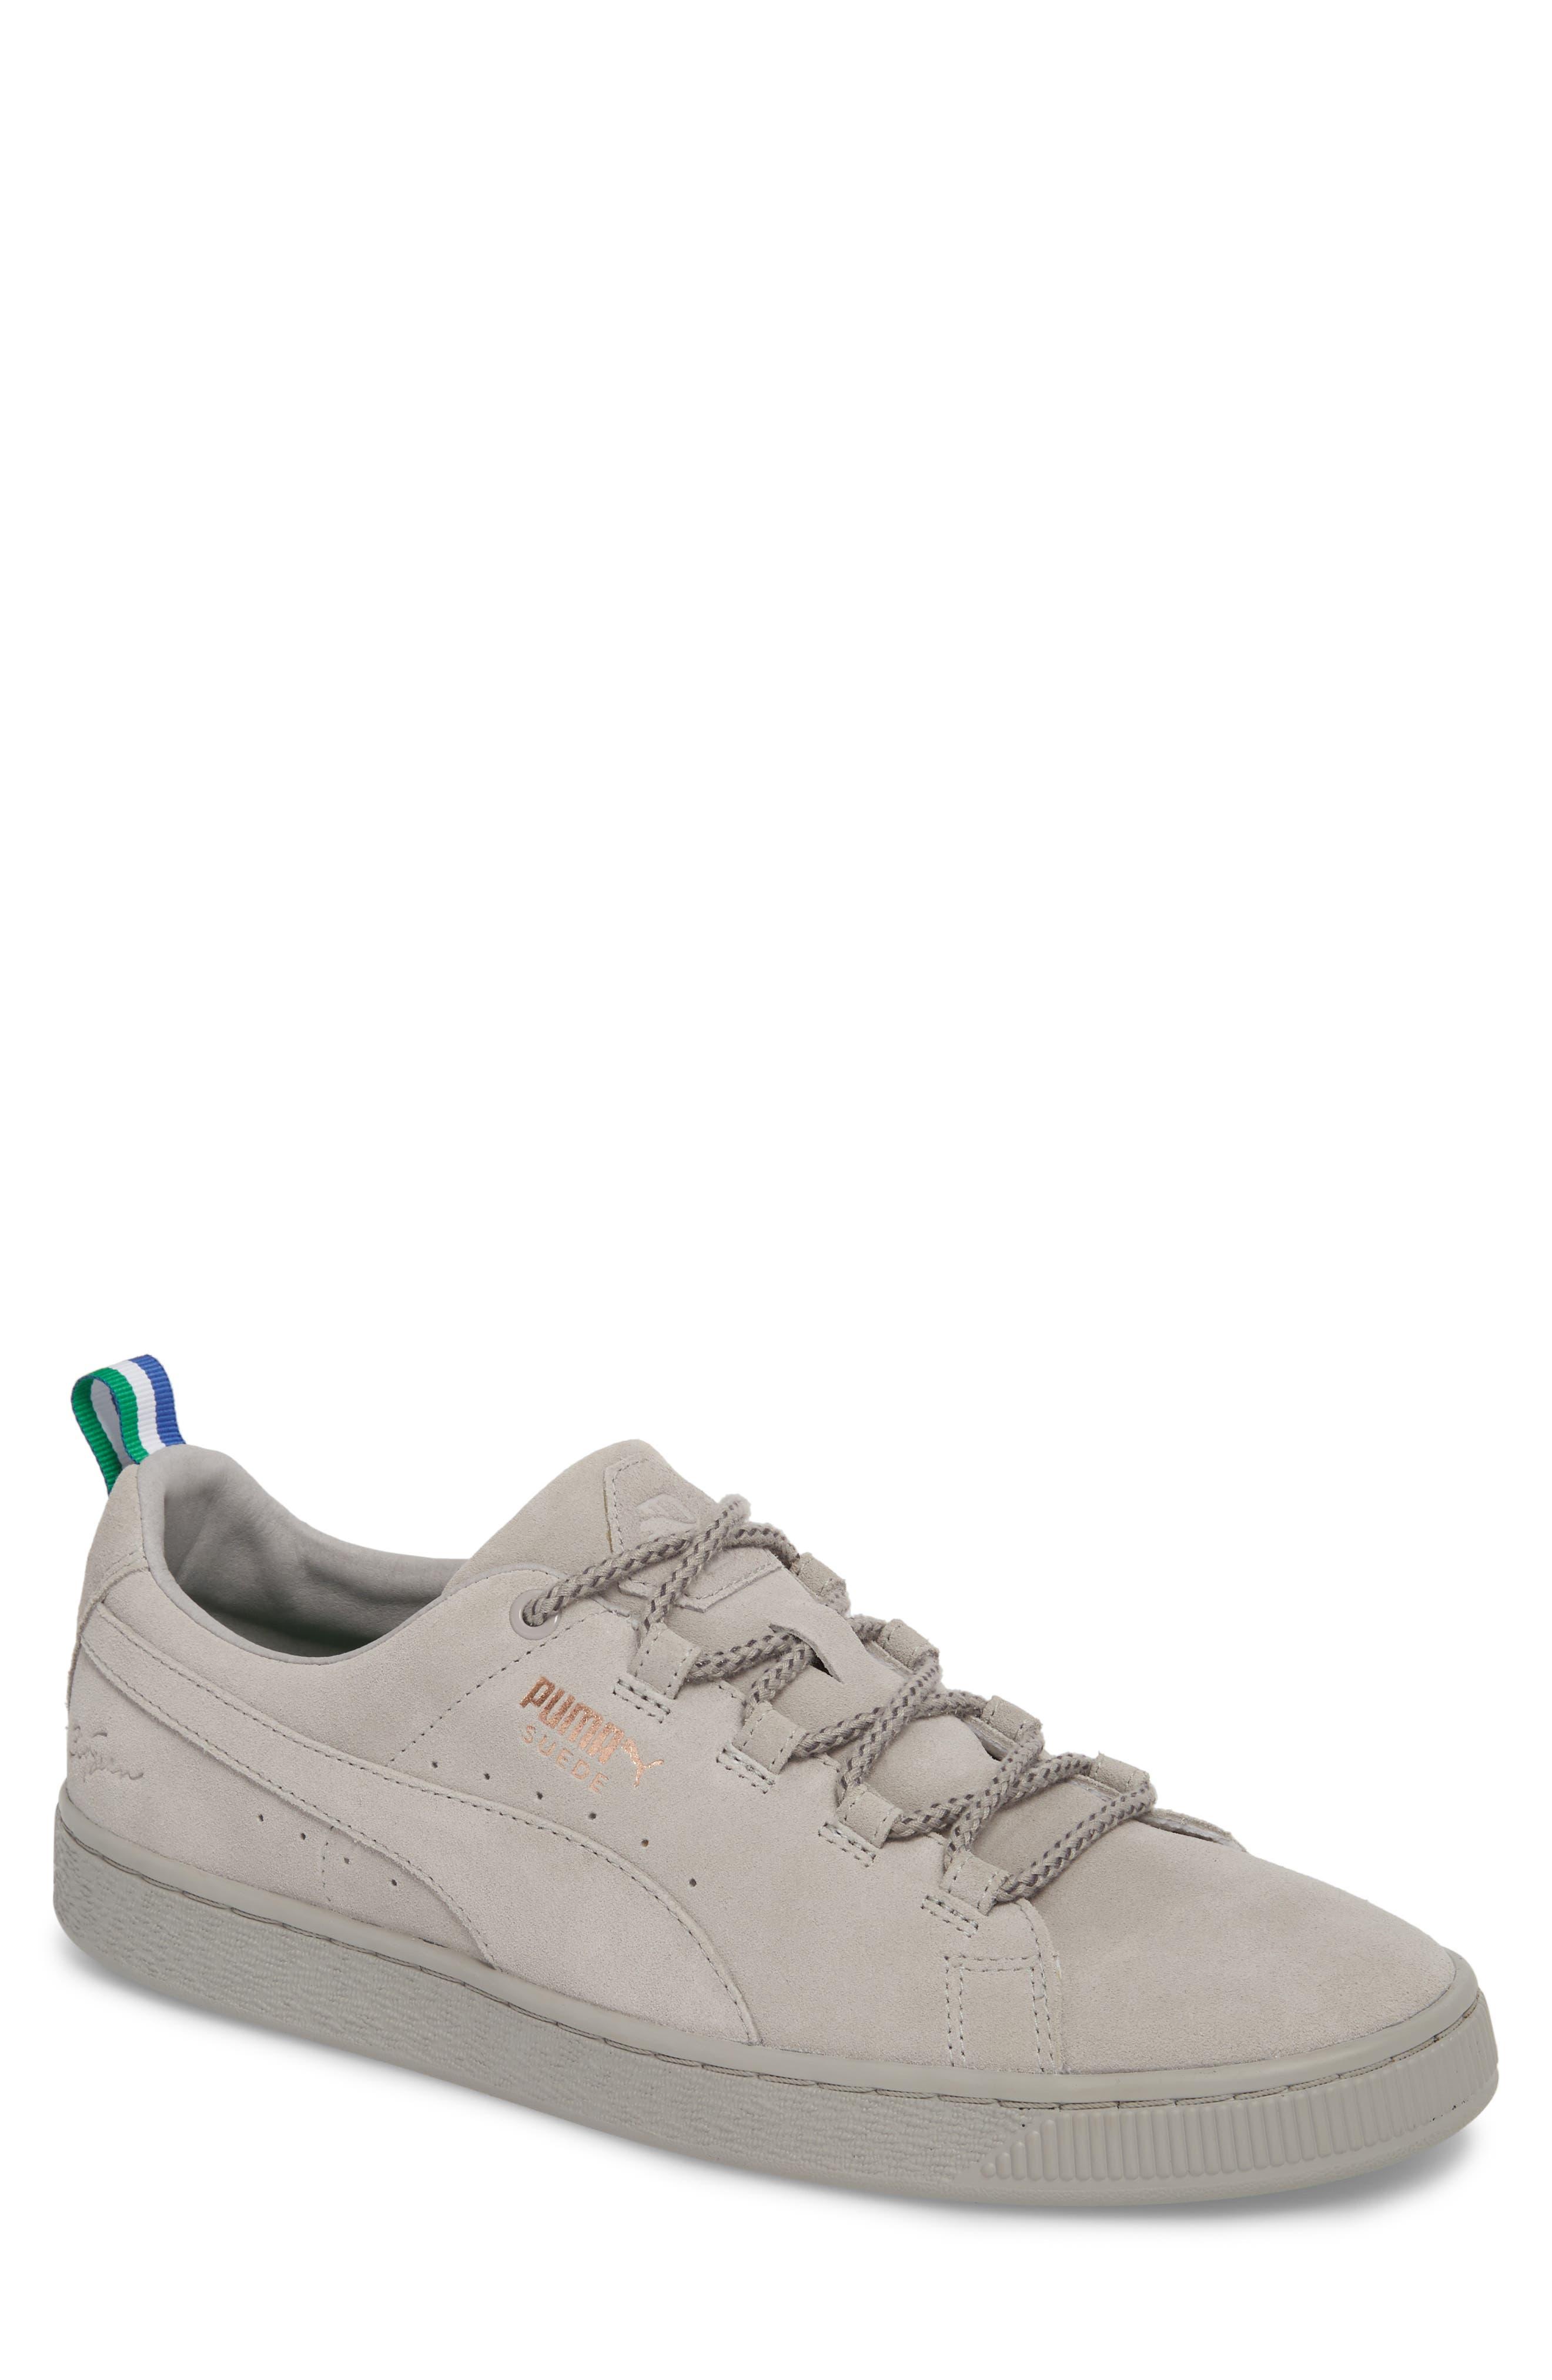 x Big Sean Suede Sneaker,                             Main thumbnail 1, color,                             Ash Leather/ Suede